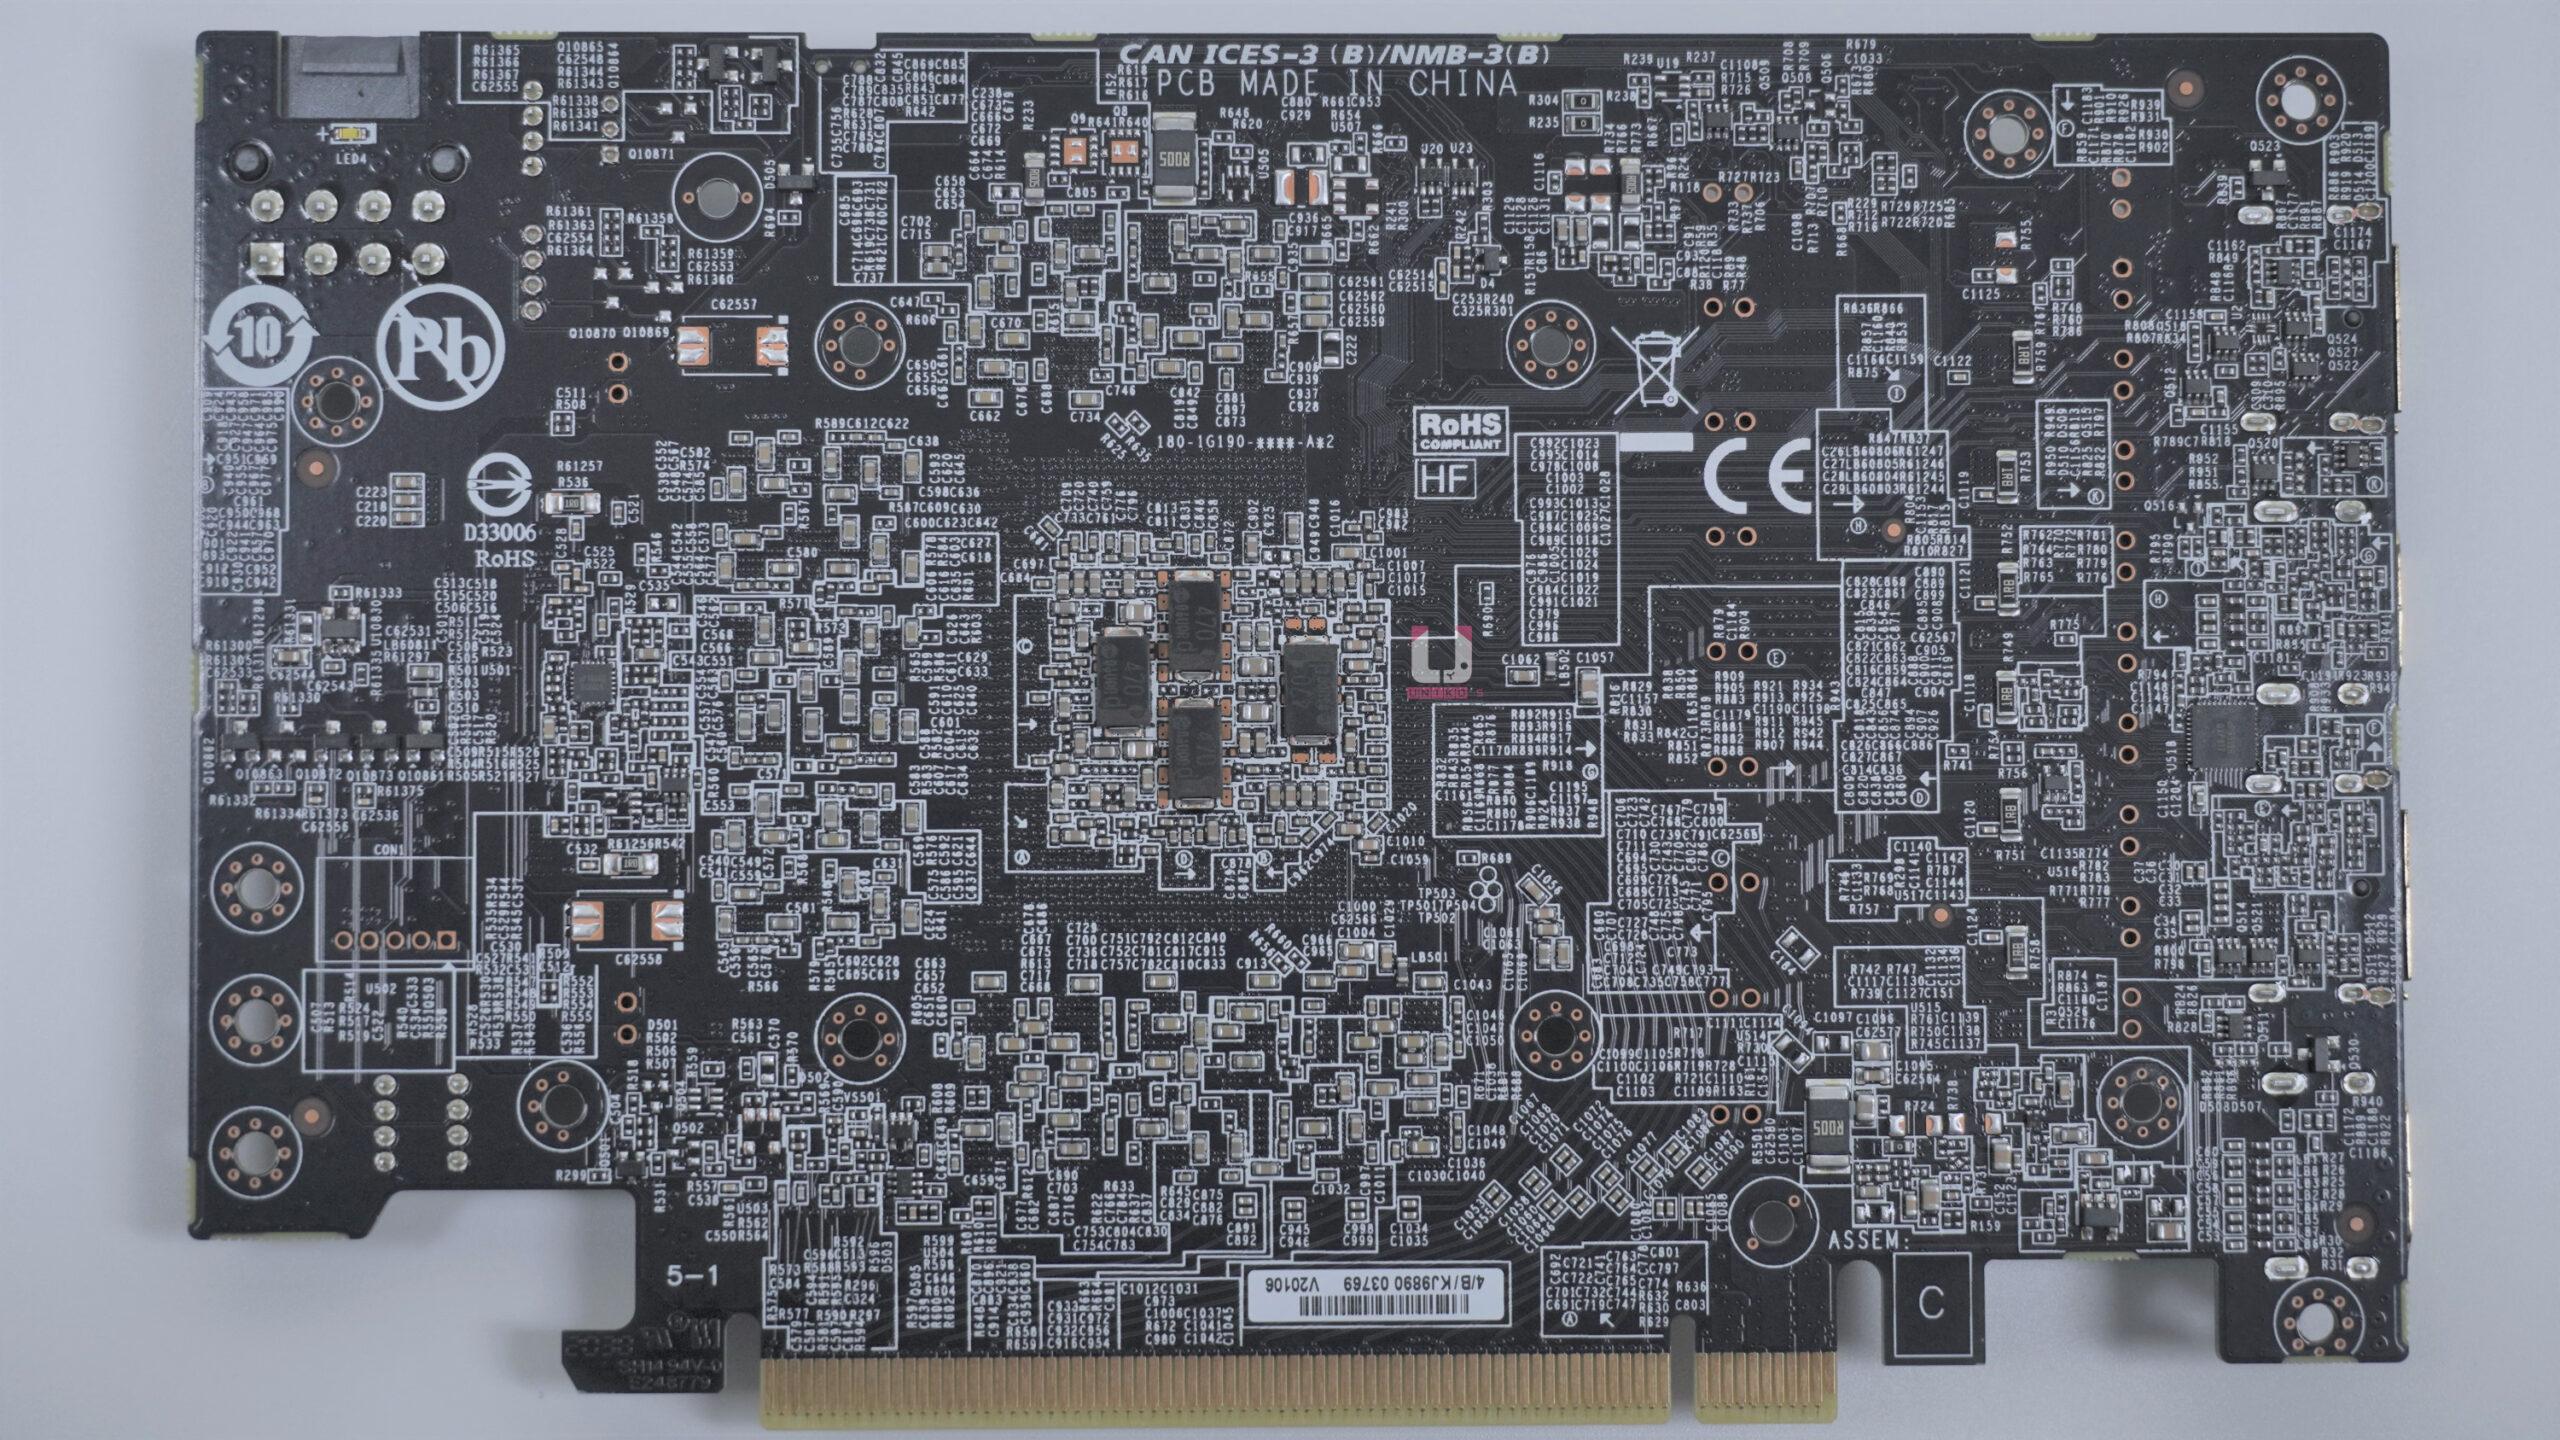 GeForce RTX 3060 Ti EAGLE OC 8G PCB 背面高解析度照片,可以點入放大看上面的元件。